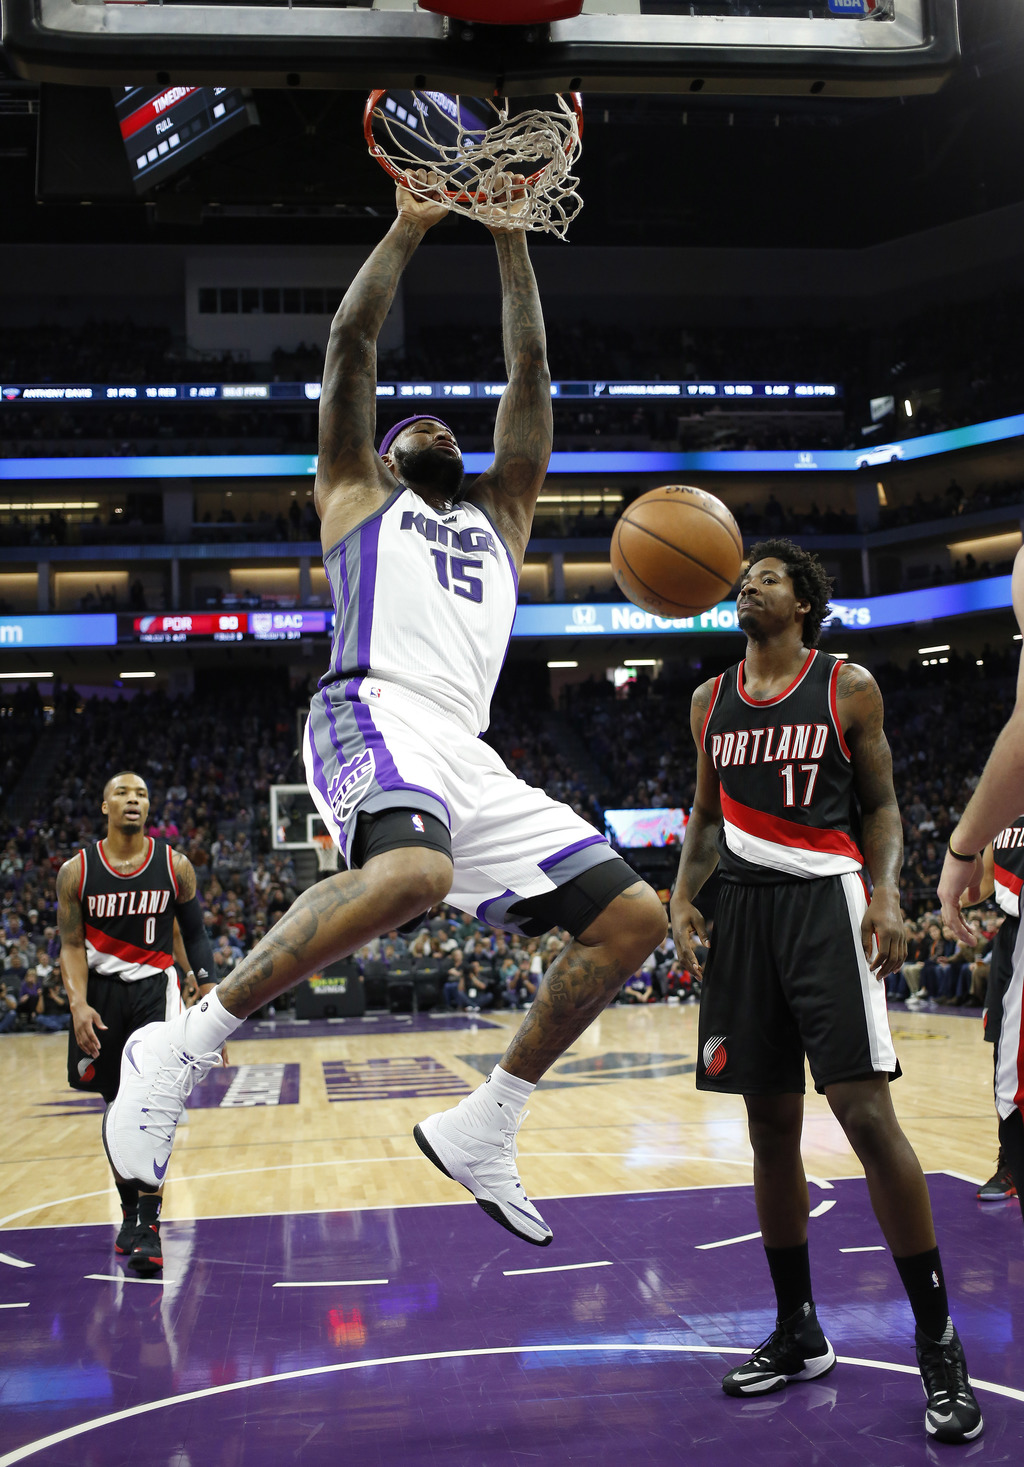 Sacramento Kings forward DeMarcus Cousins, center, hangs from the rim after dunking as Portland Trail Blazers' Damian Lillard, left, an...